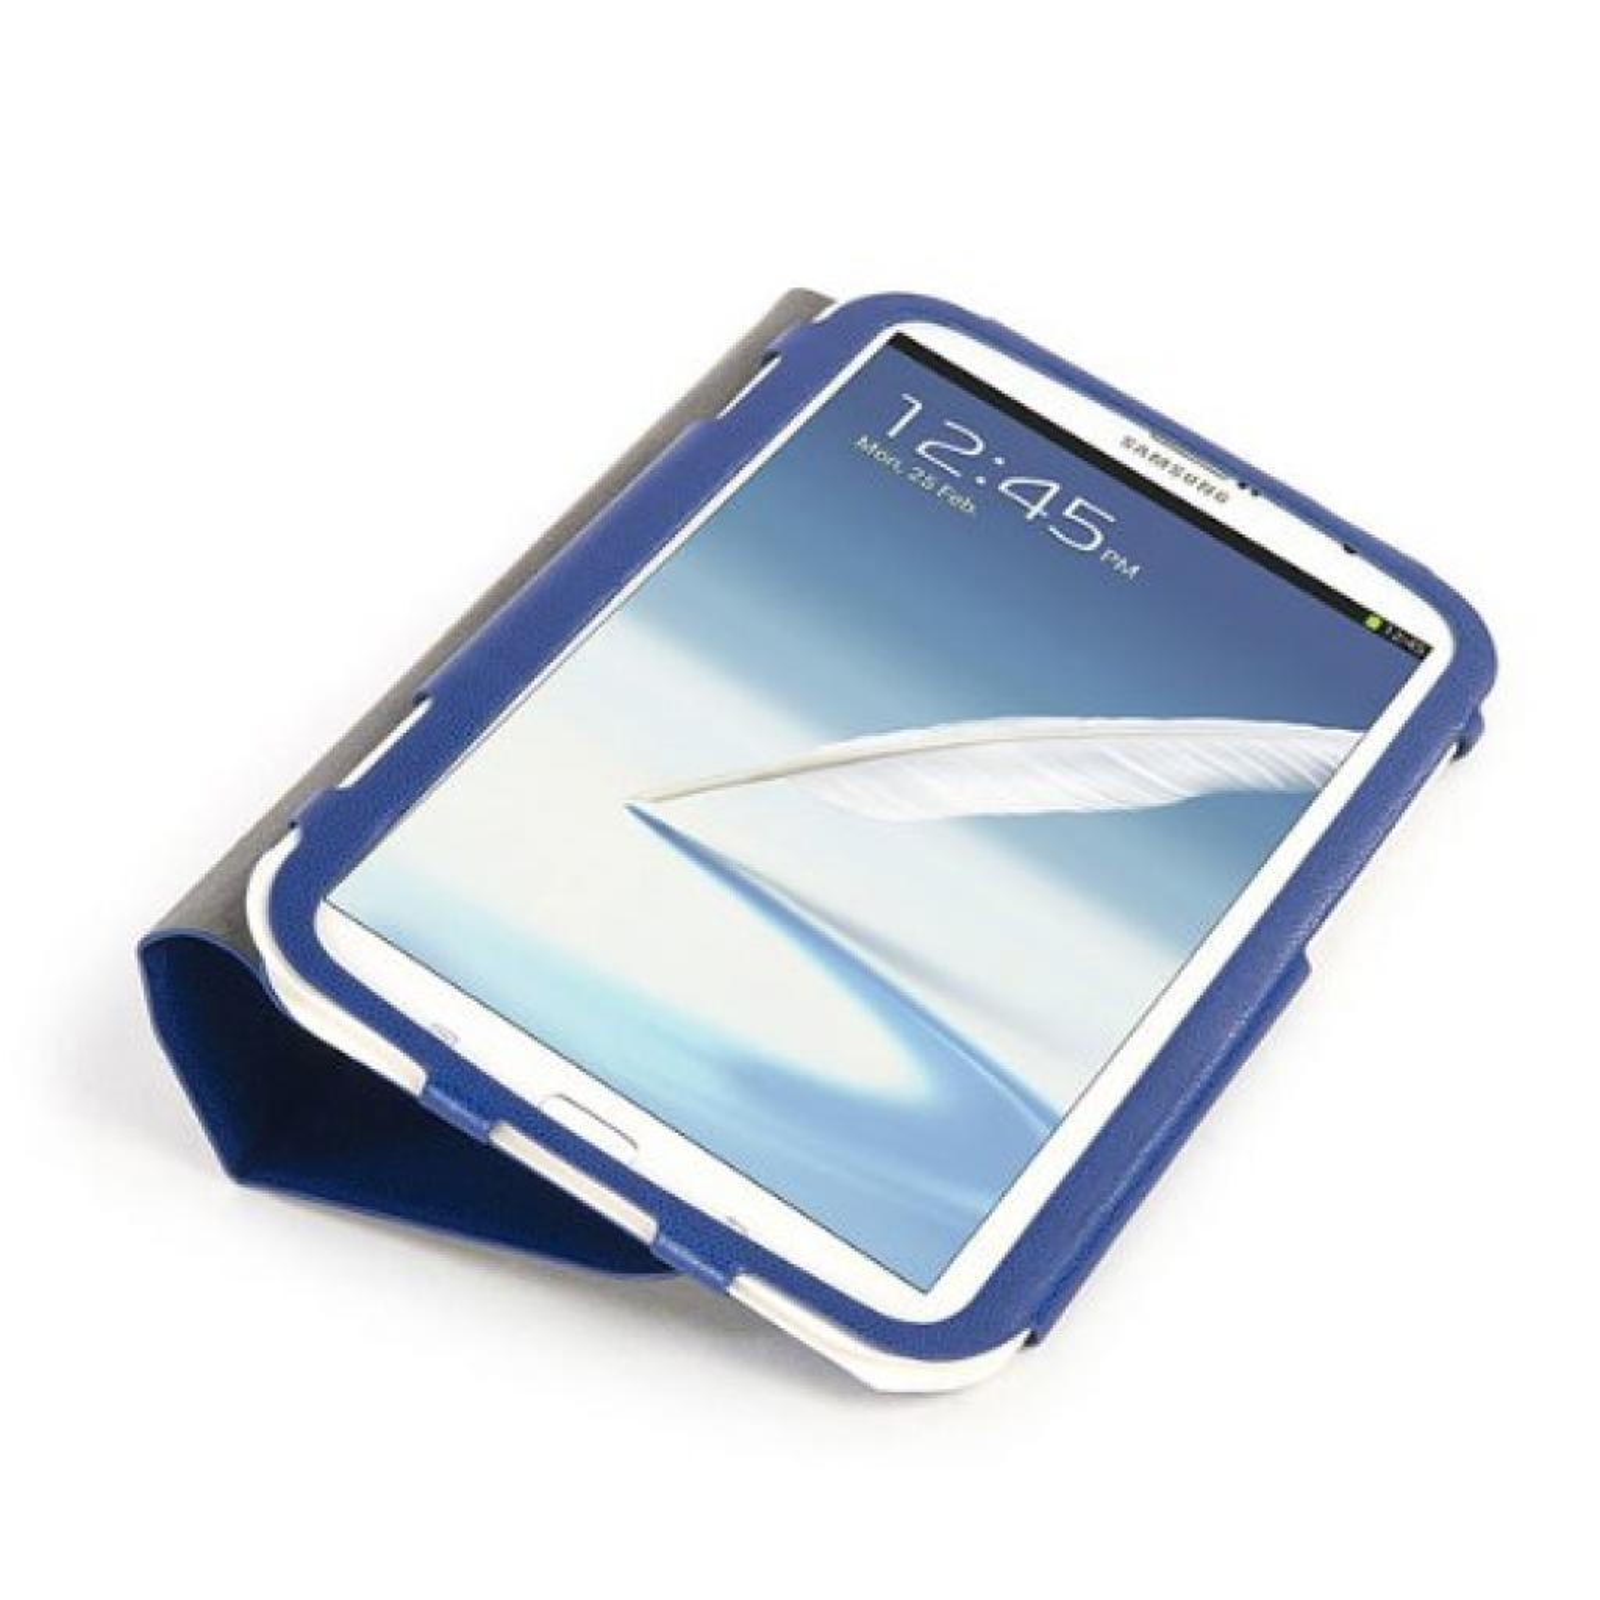 Чехол для планшета Tucano Galaxy Tab 3 8.0 Leggero Blue (TAB-LS38-B) изображение 3